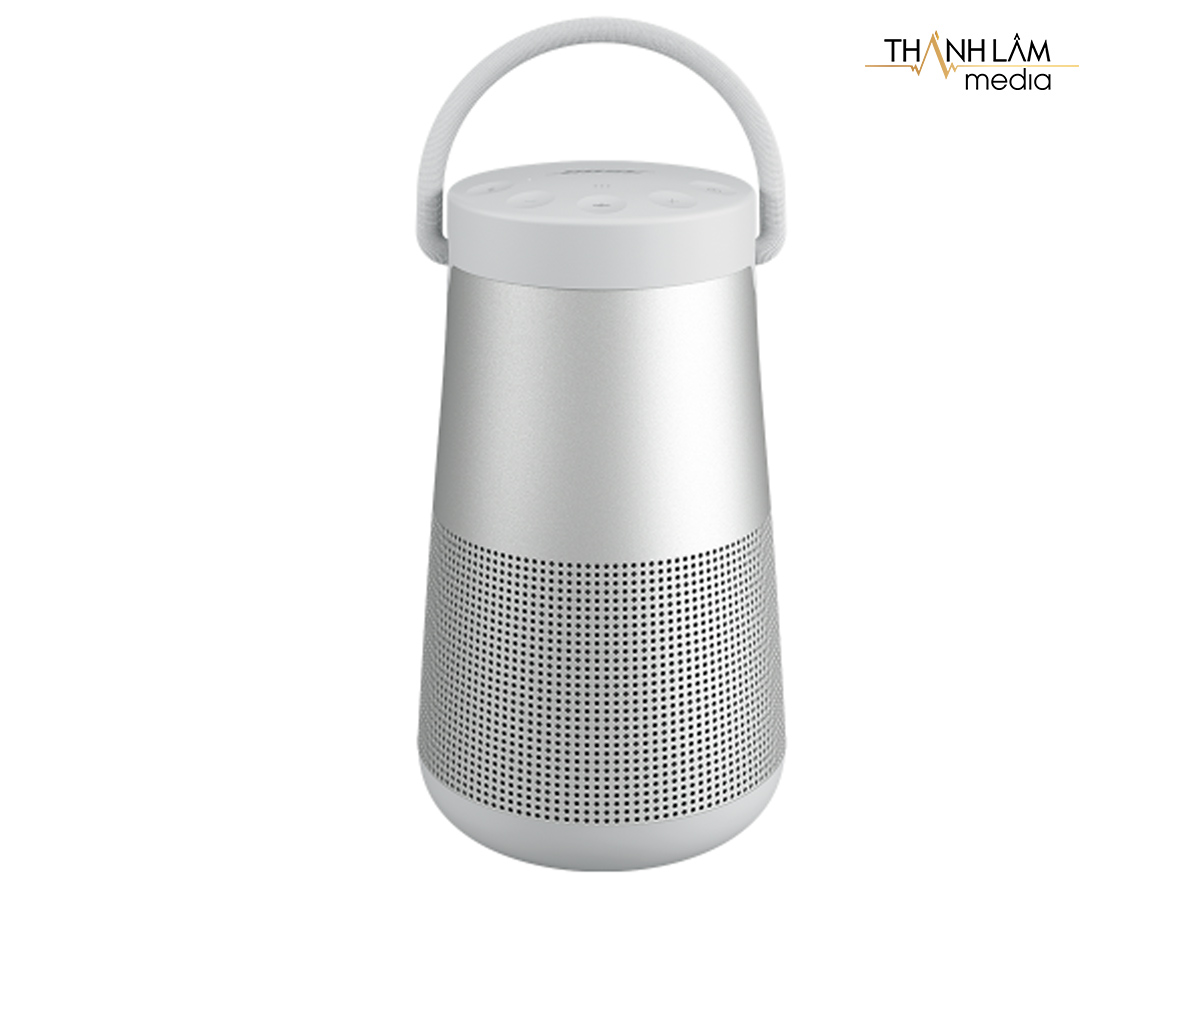 Loa-Bose-SoundLink-Revolve-Plus-Trang-4